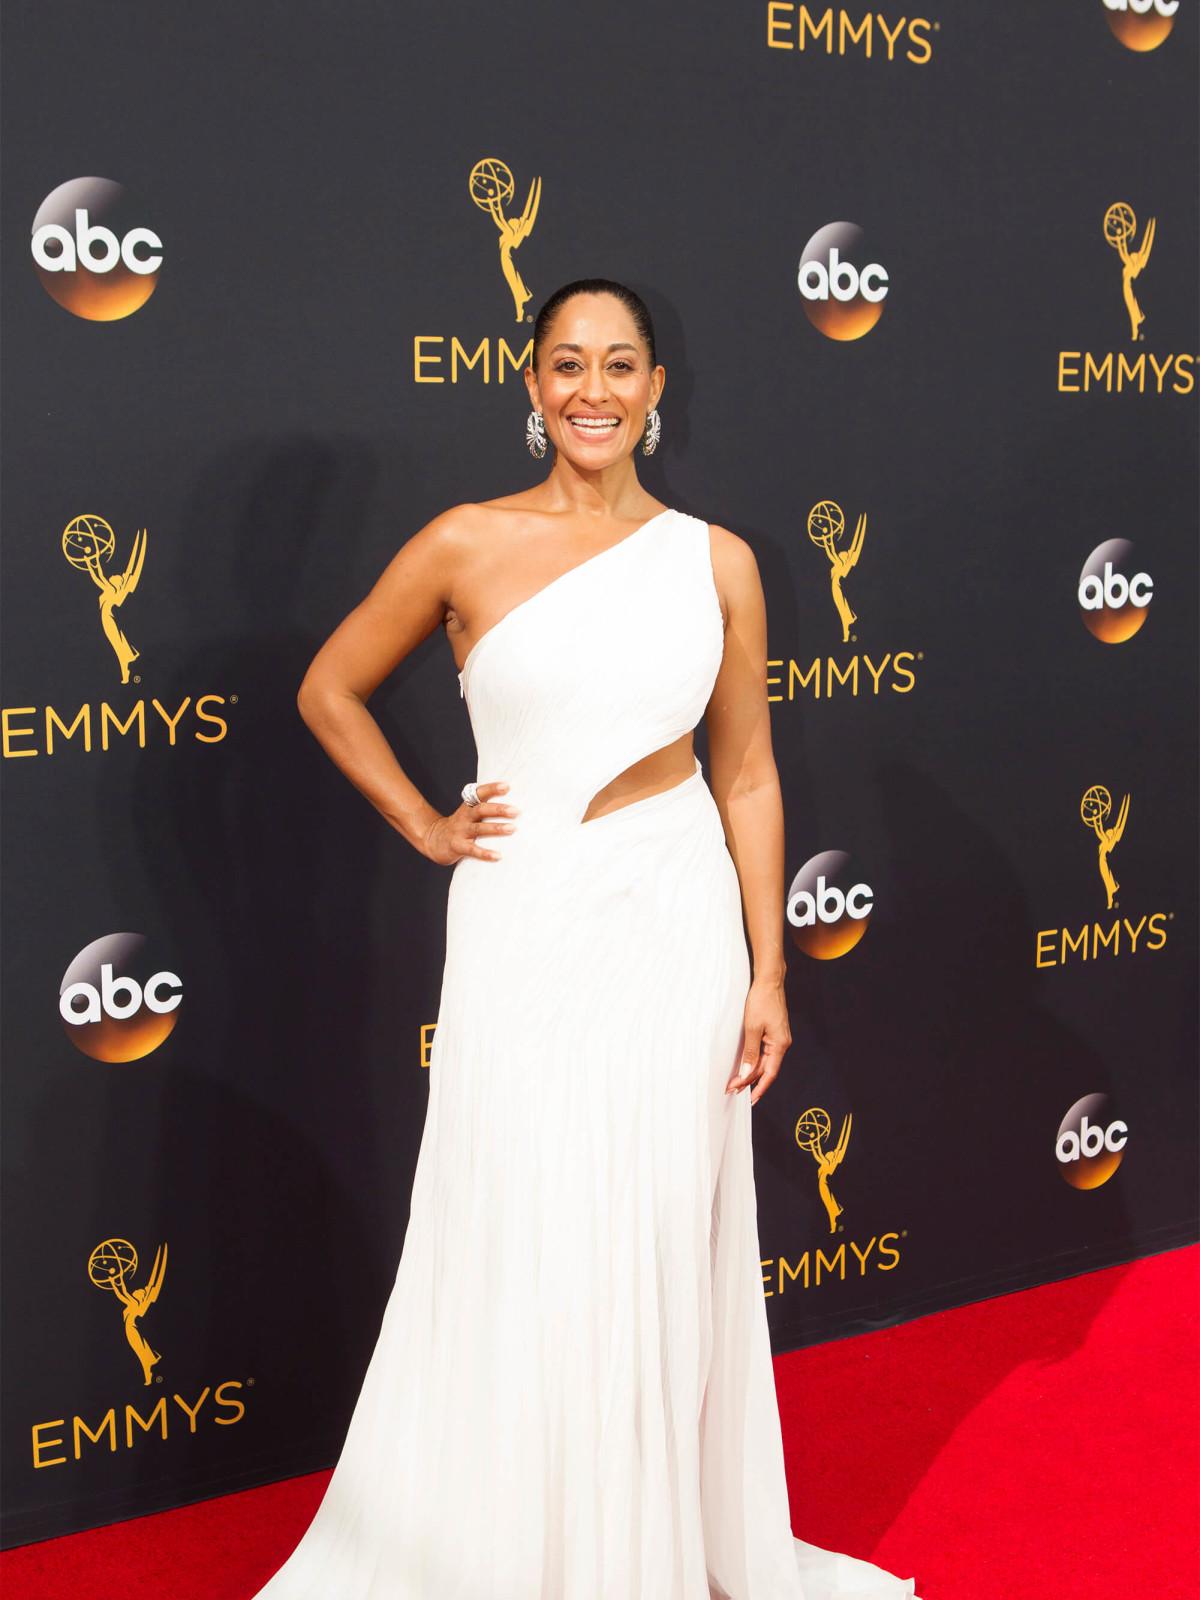 Tracie Ellis Ross in Ralph Lauren gown at Emmy